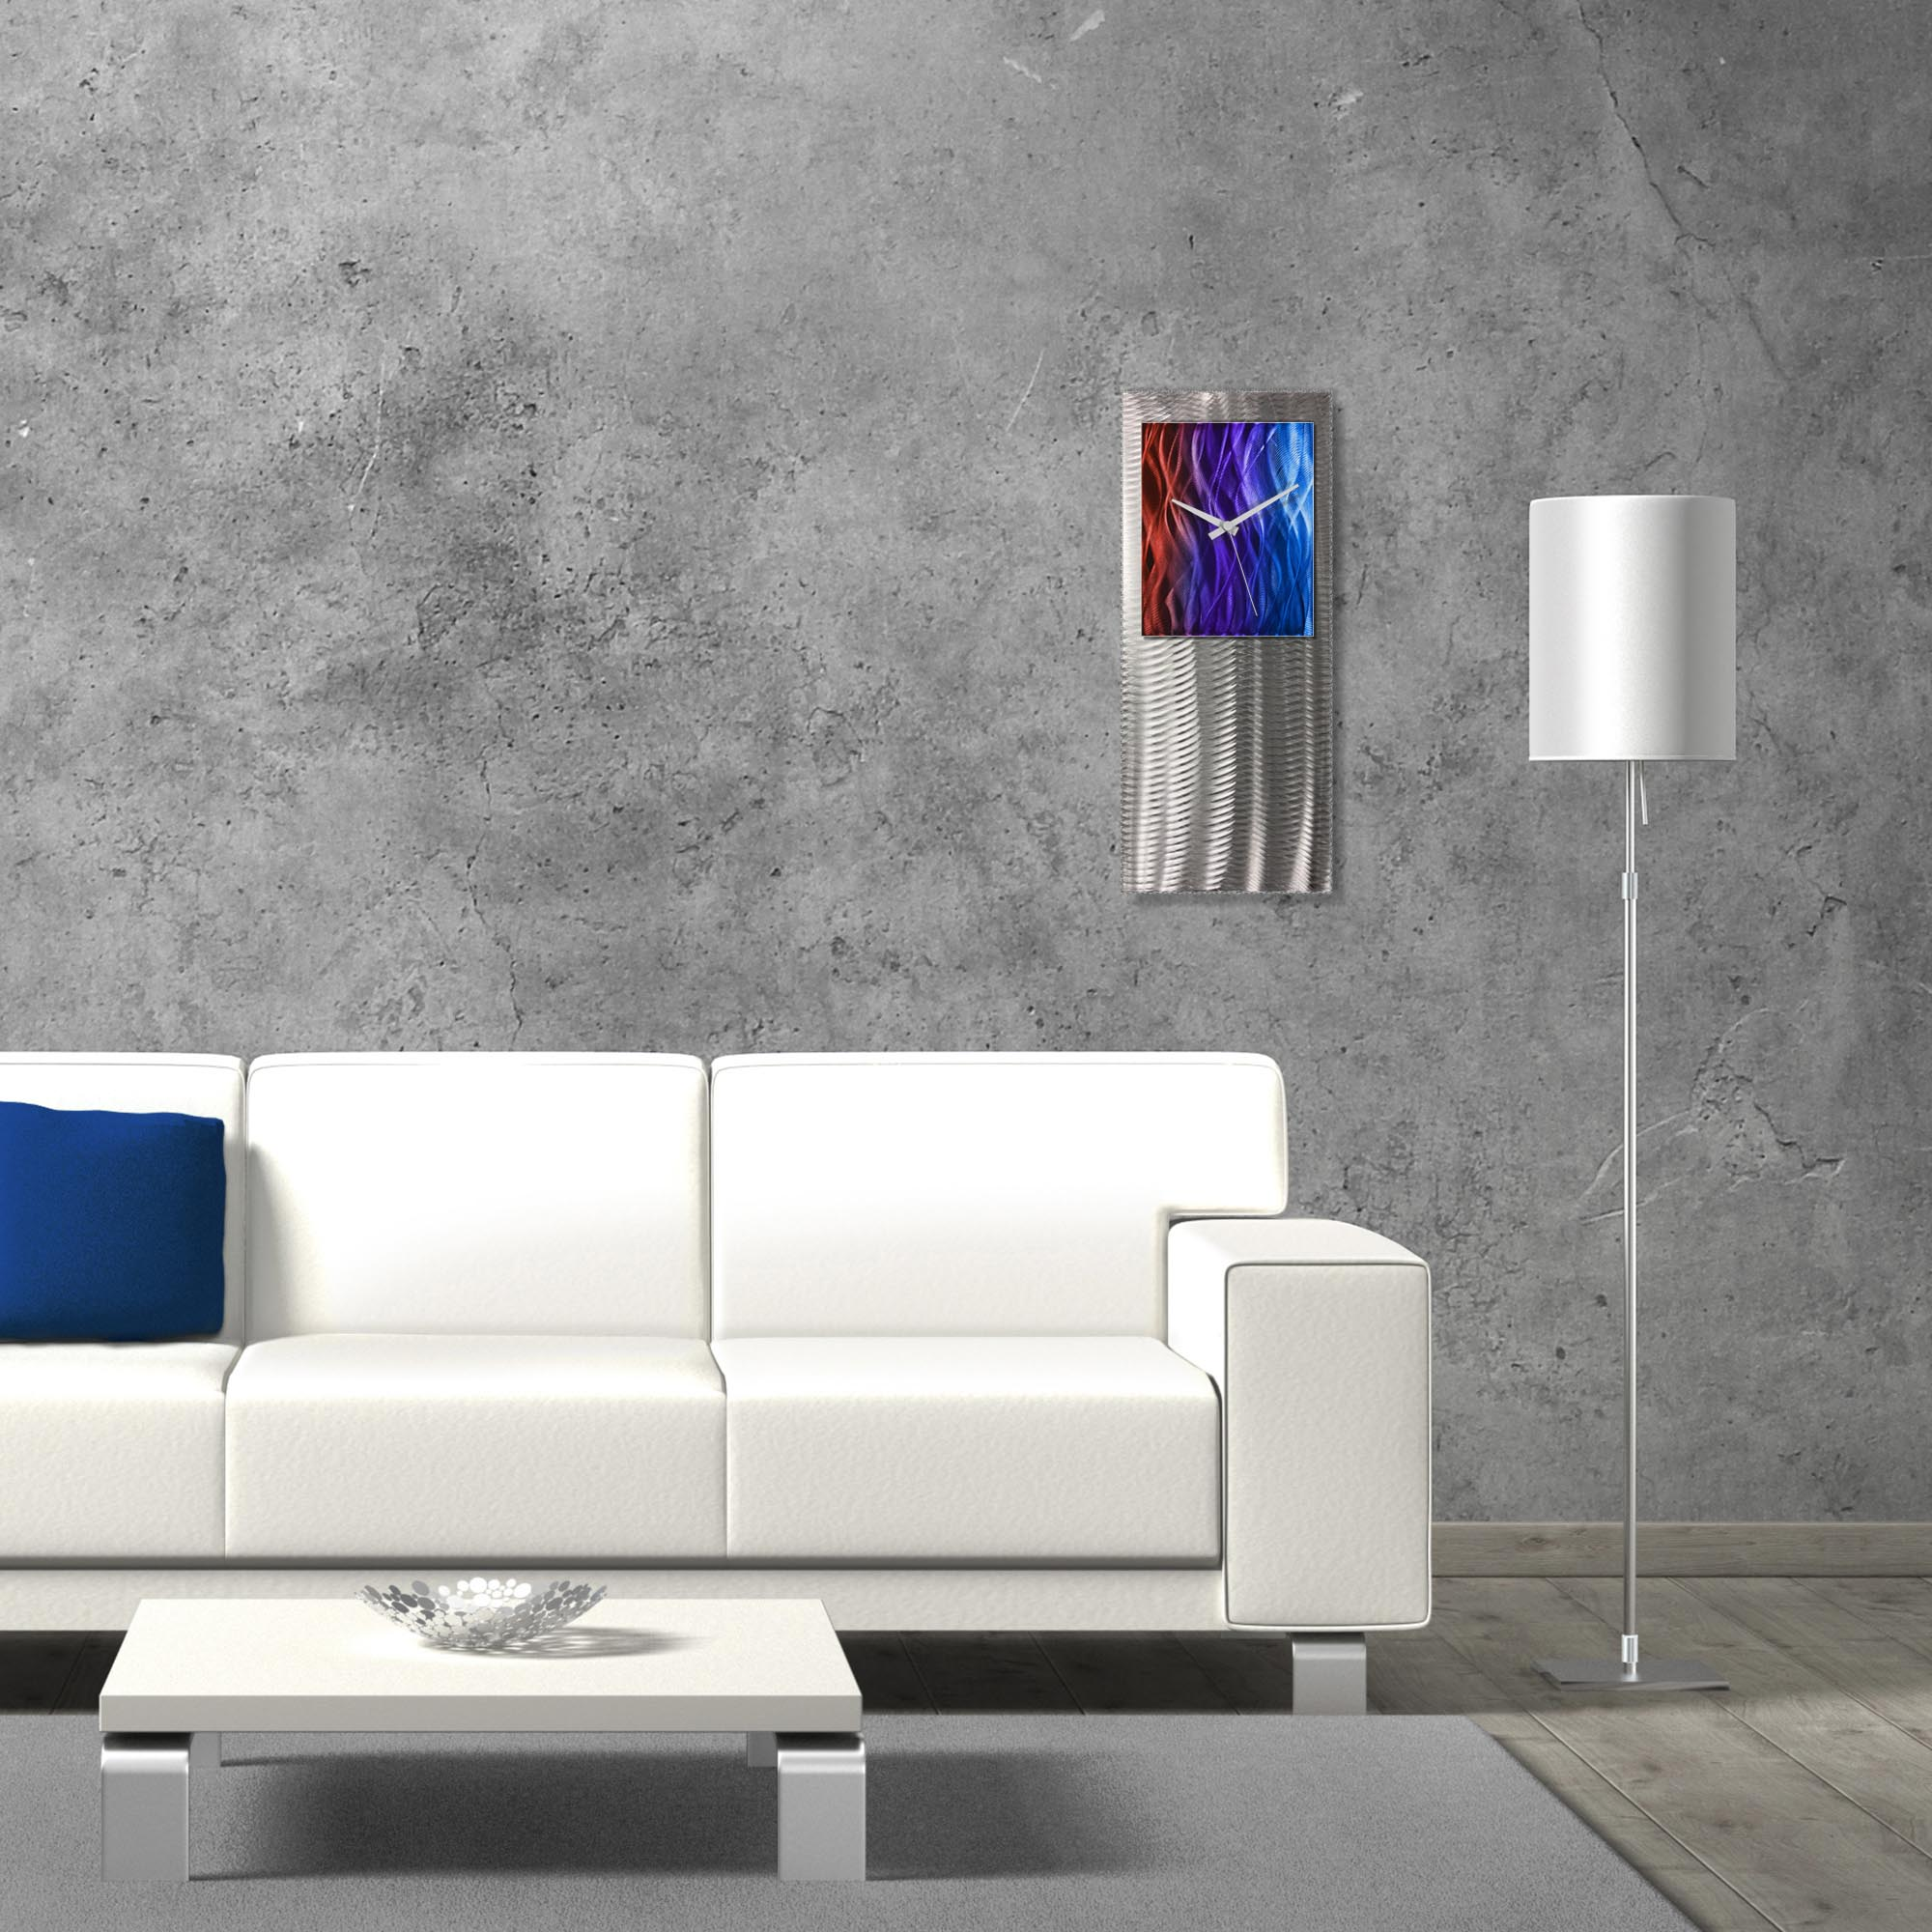 Metal Art Studio Abstract Decor Sunset Studio Clock 10in x 24in - Lifestyle View